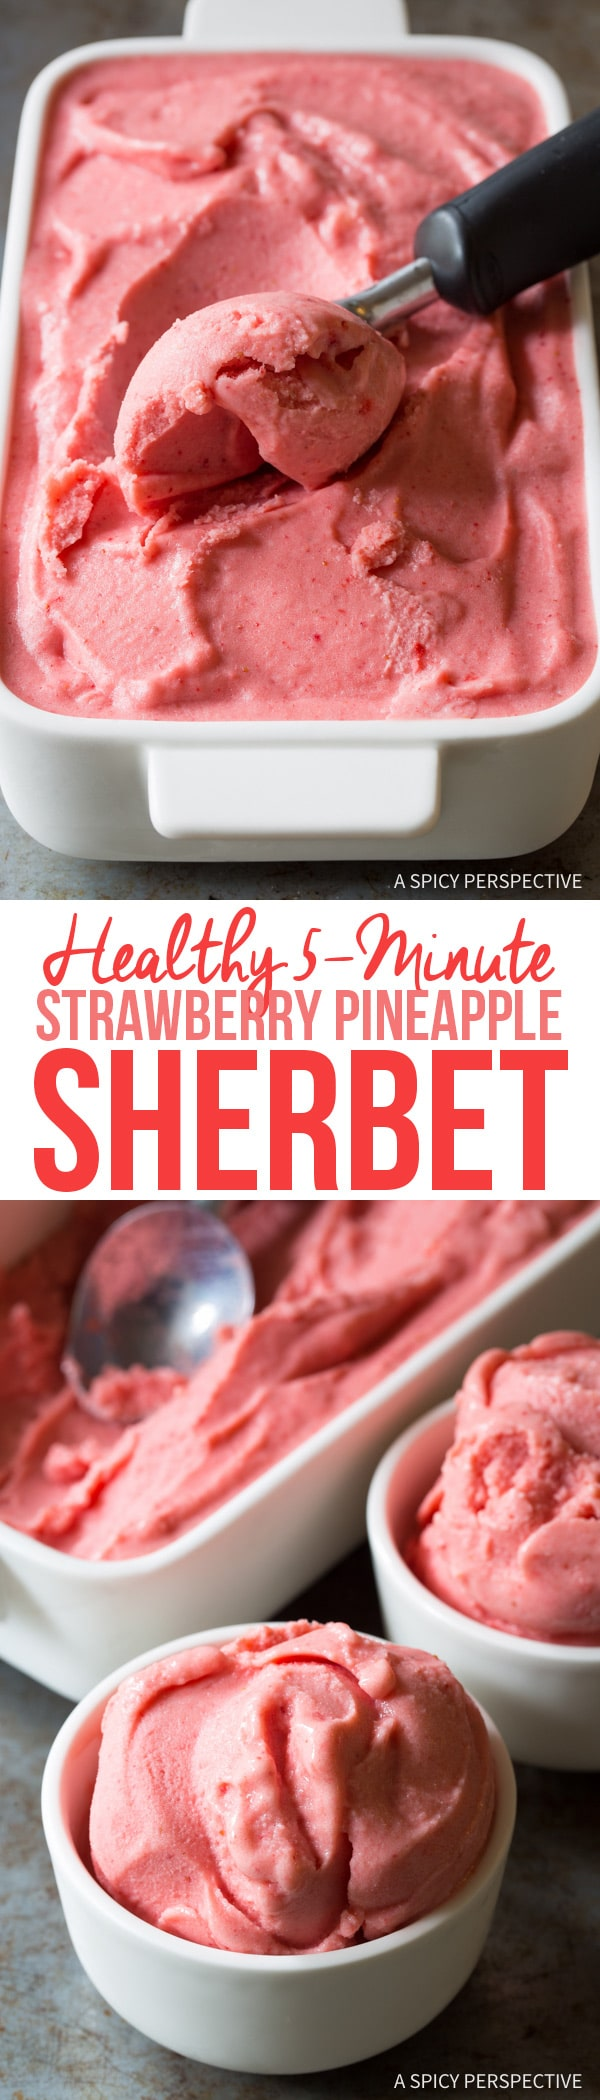 Healthy 5-Minute Strawberry Pineapple Sherbet Recipe